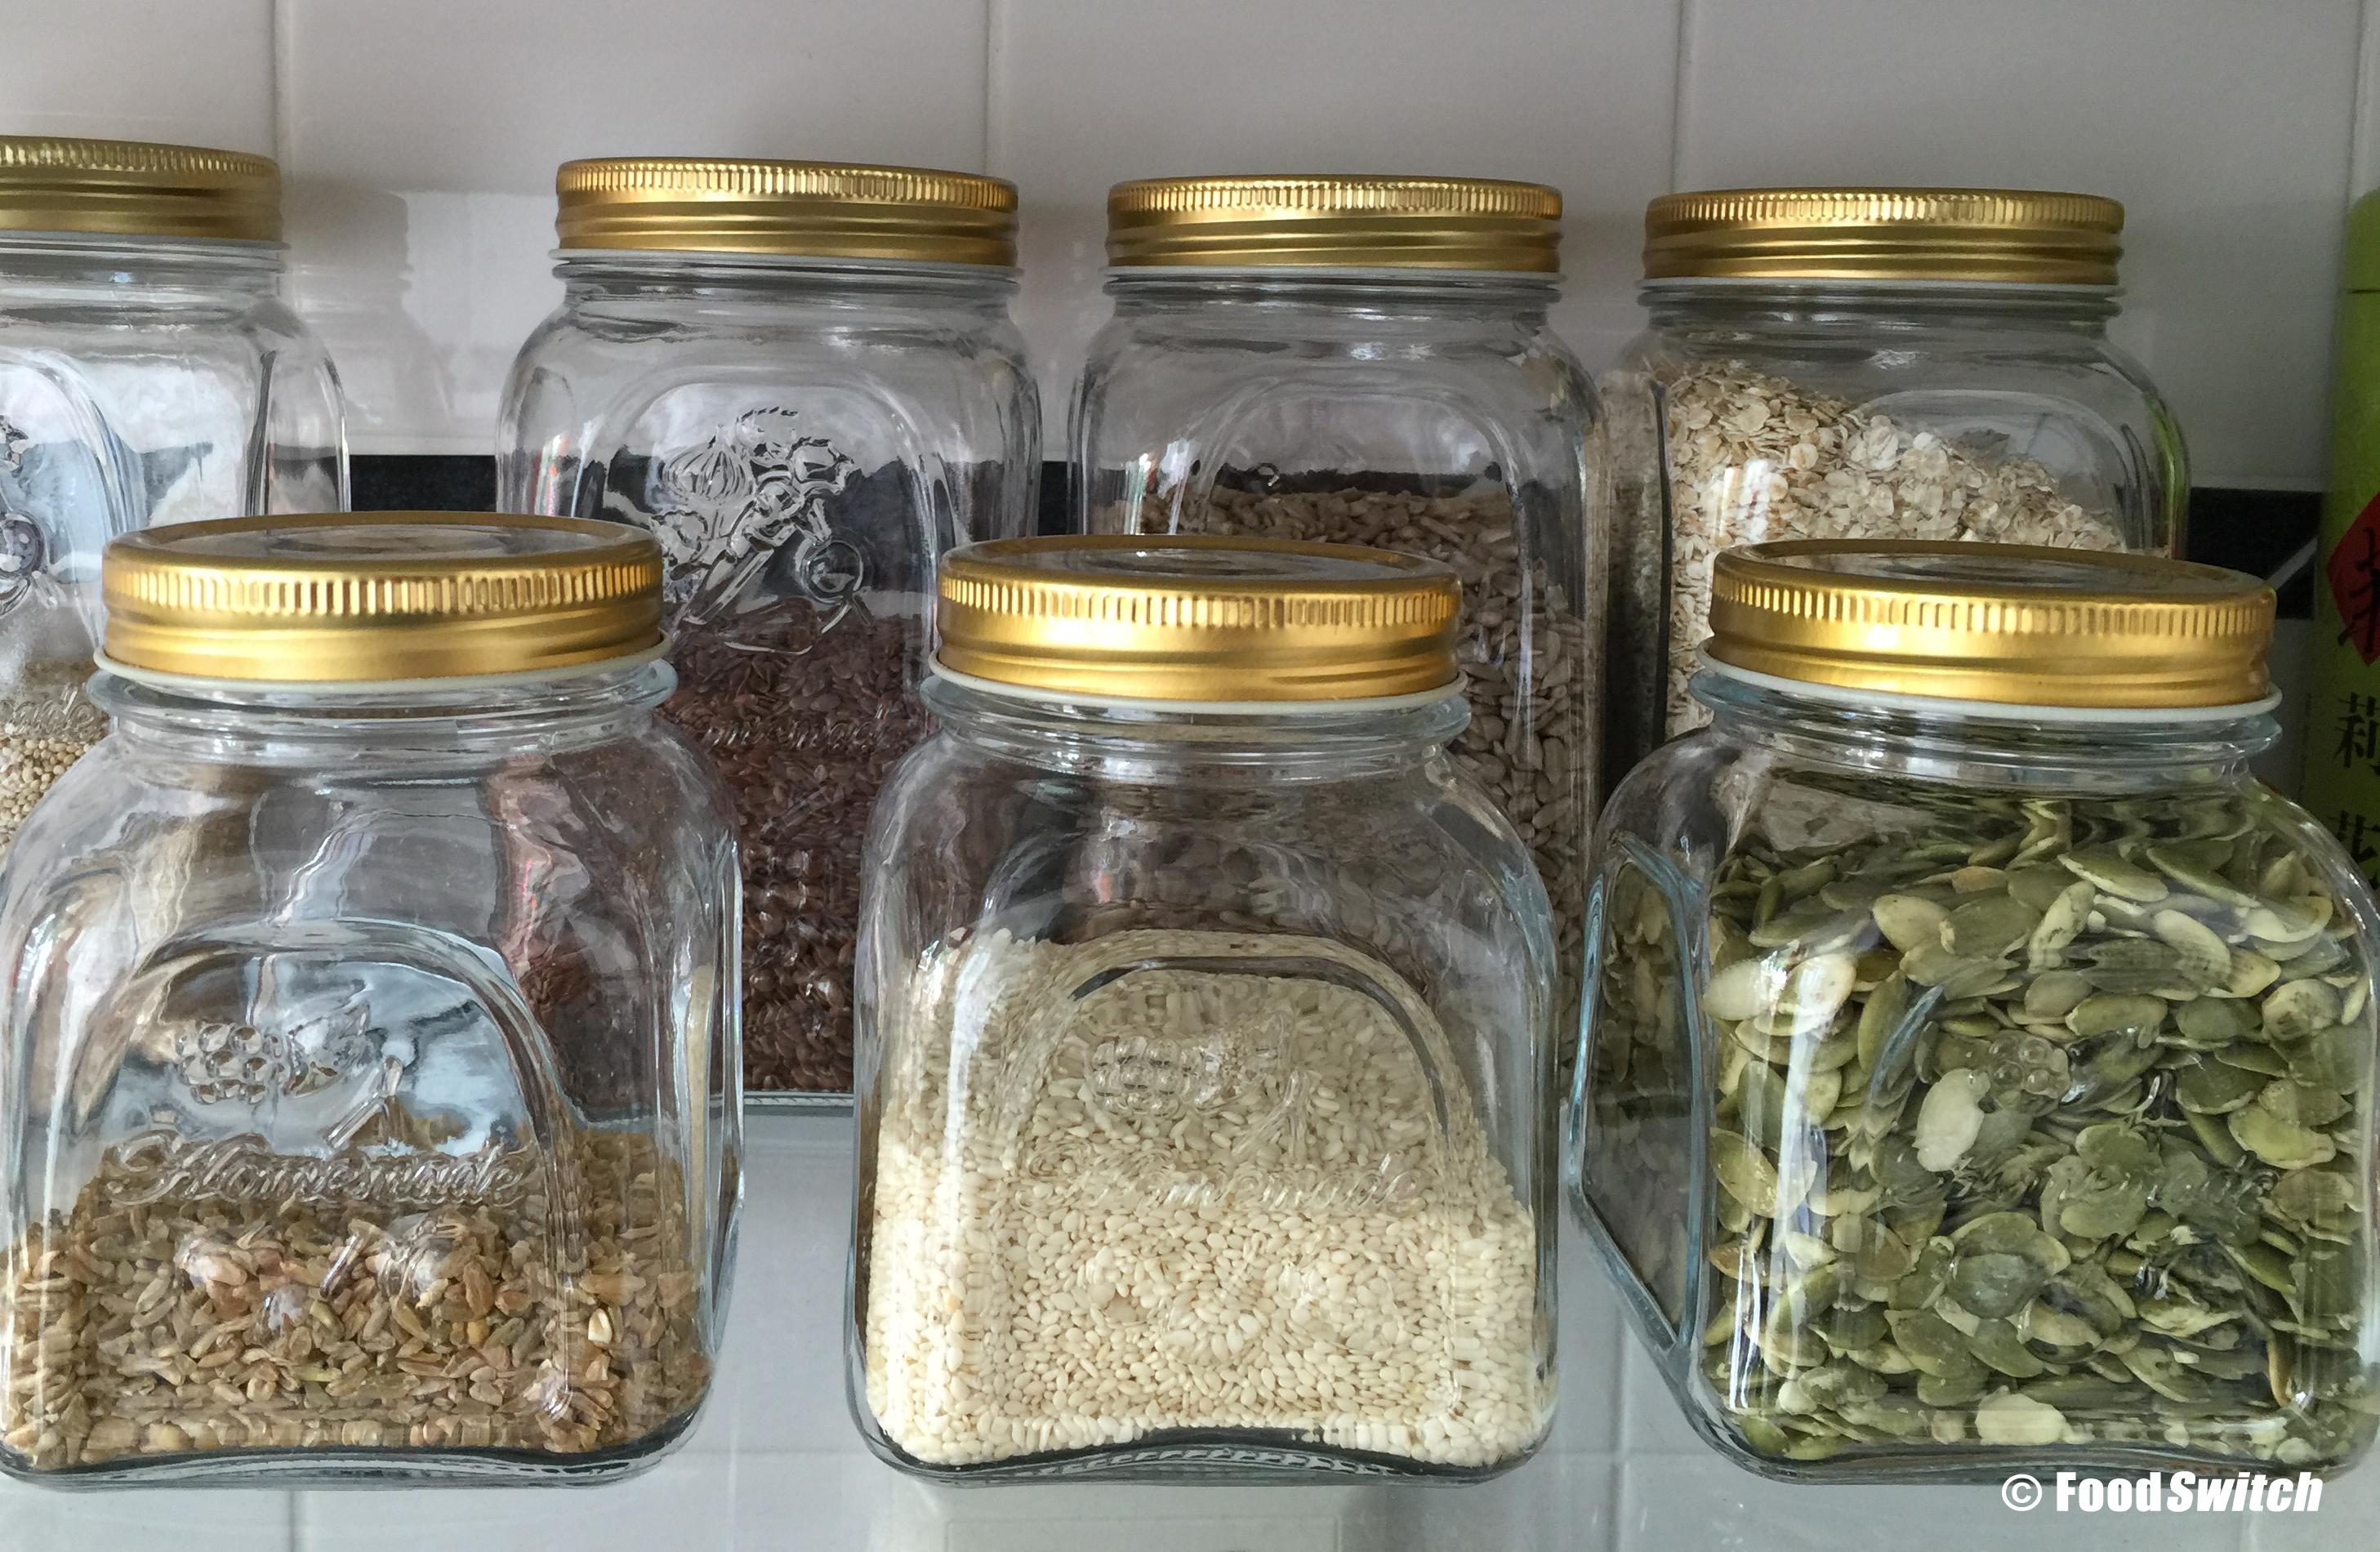 Werkplek Keuken Inrichten : Je keuken inrichten in vijf stappen stek woon lifestyle magazine